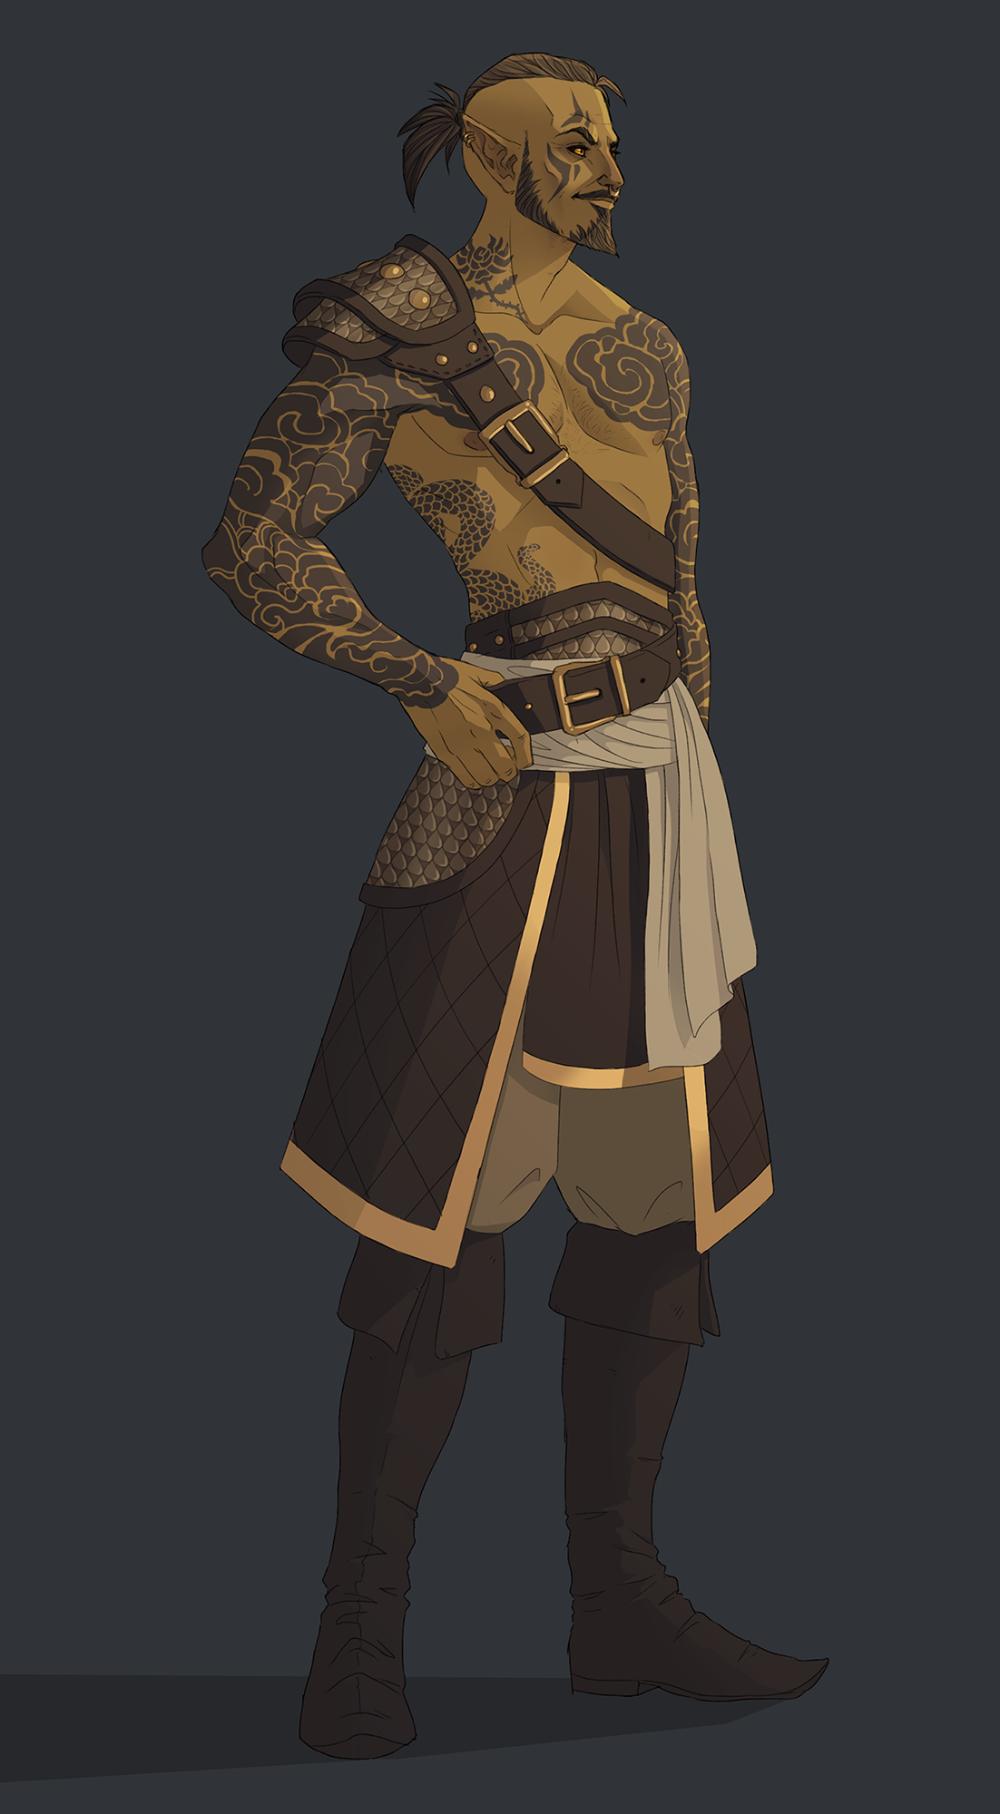 My Altmer Templar Aravos Silvertongue A Smuggler A Fence And A Friend Of High Quality Summerset Wine Elderscrolls In 2021 Elder Scrolls Bard Elder Scrolls Online